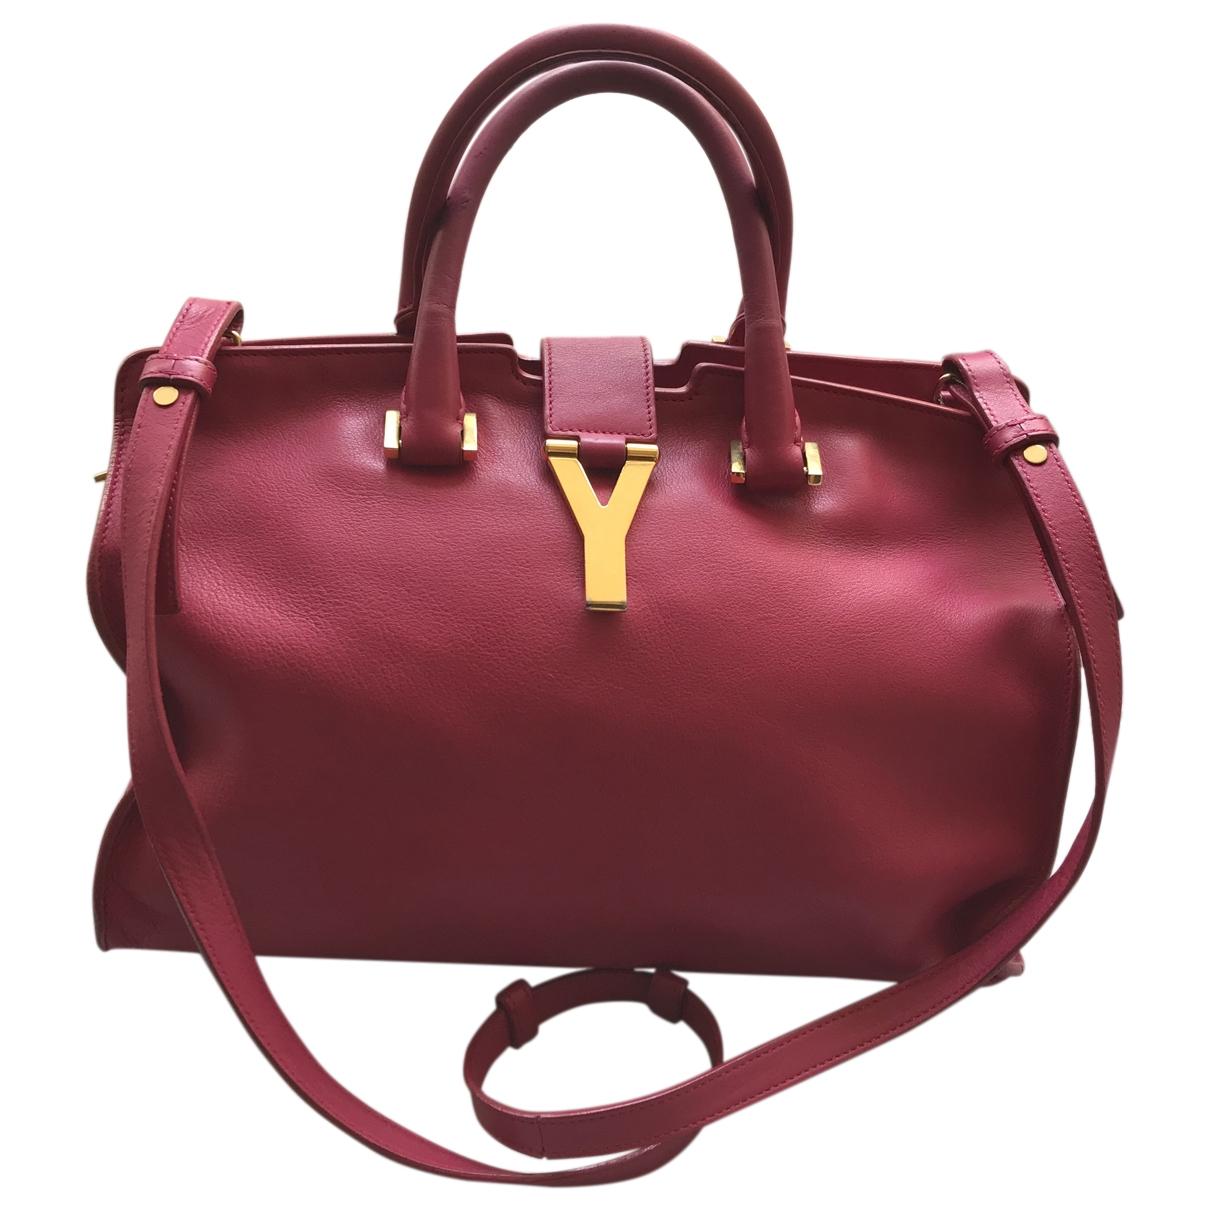 Saint Laurent Chyc Pink Leather handbag for Women \N